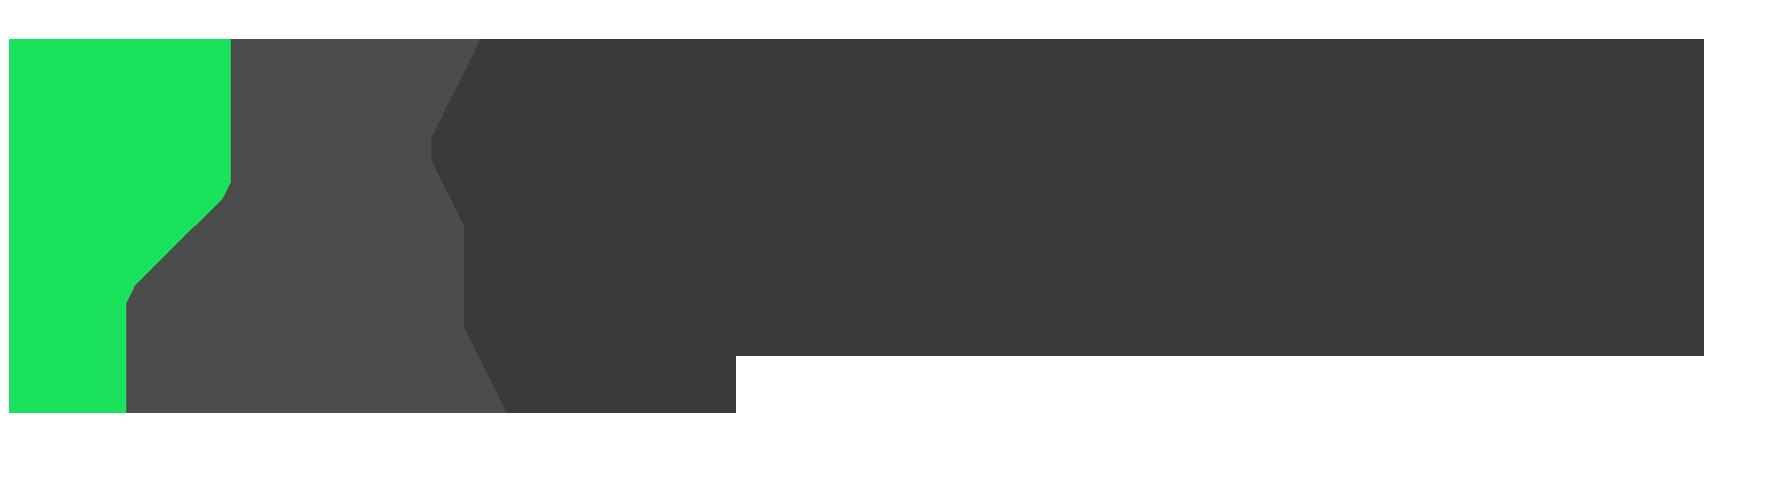 TechPana   Digging into Tech